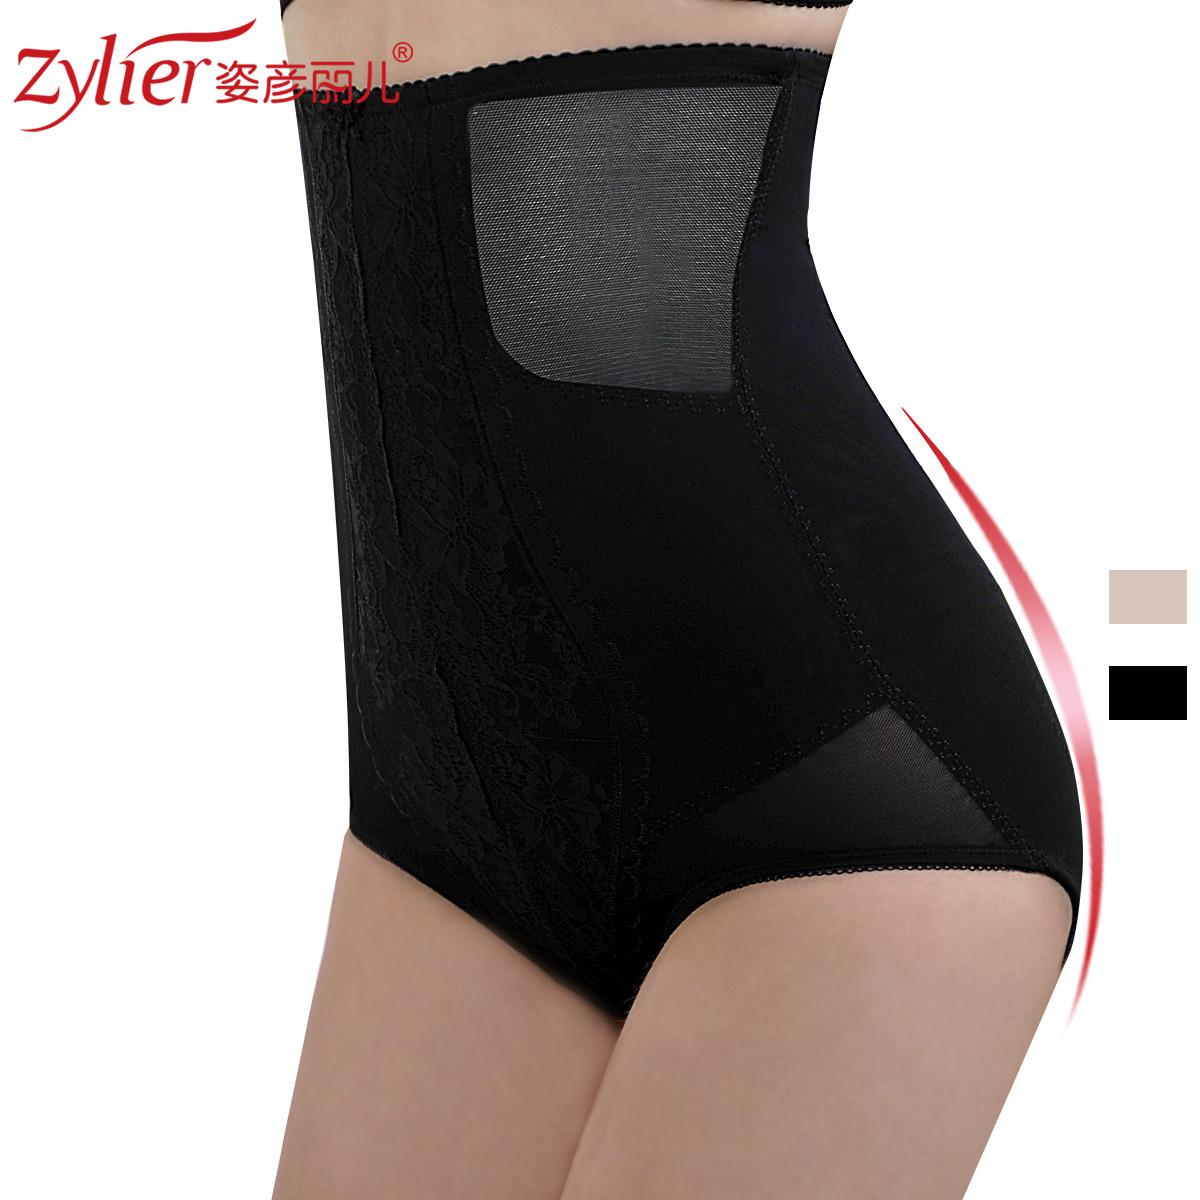 2012 winter high waist body shaping pants body shaping panties abdomen drawing pants sk79